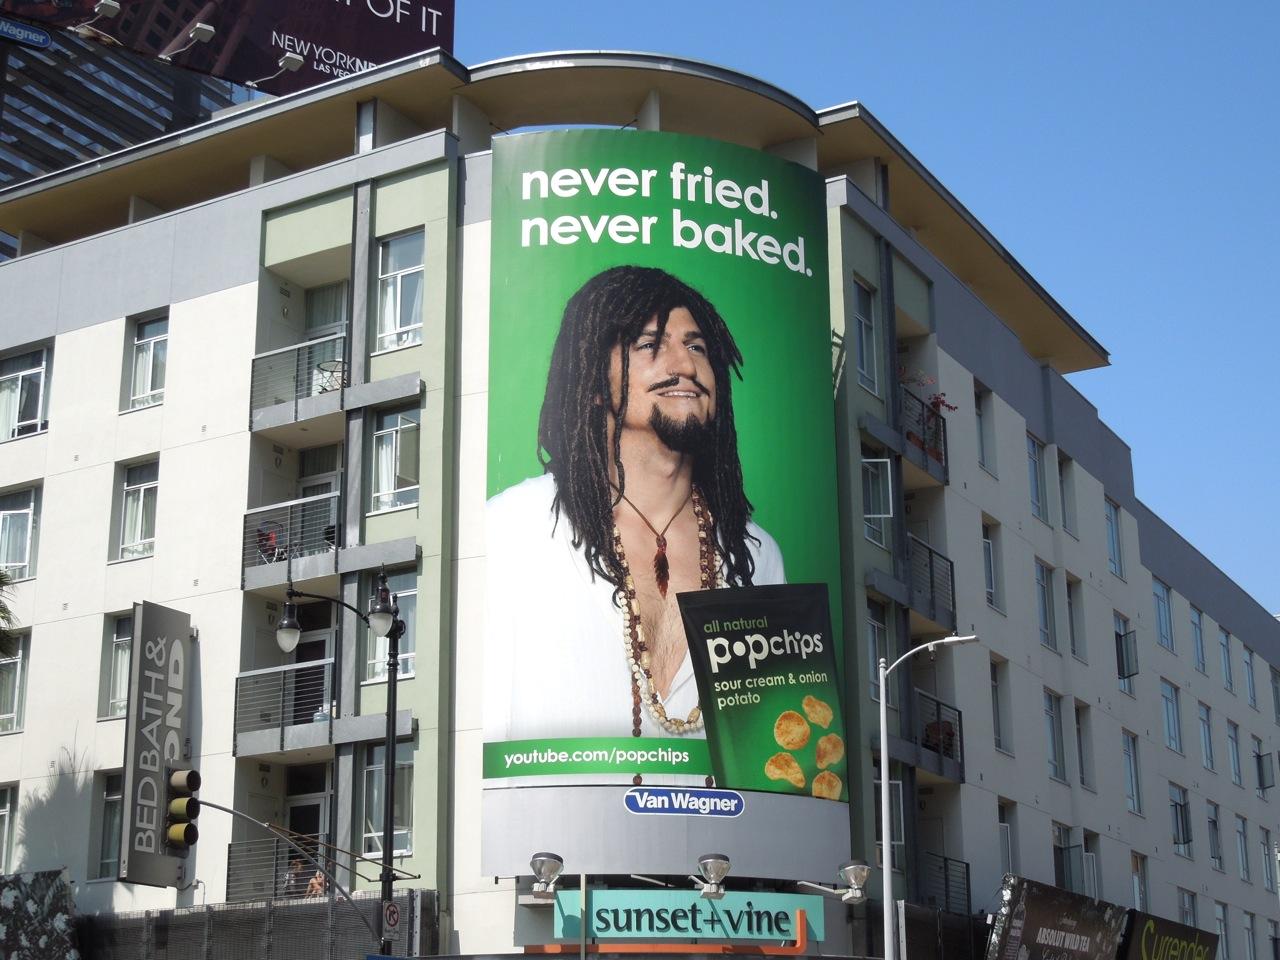 http://2.bp.blogspot.com/-_unDJHKz5rA/T9f1Y4dT-1I/AAAAAAAAsbs/EEfcT0VVMnw/s1600/AshtonKutcher+Nigel+popchips+billboard.jpg